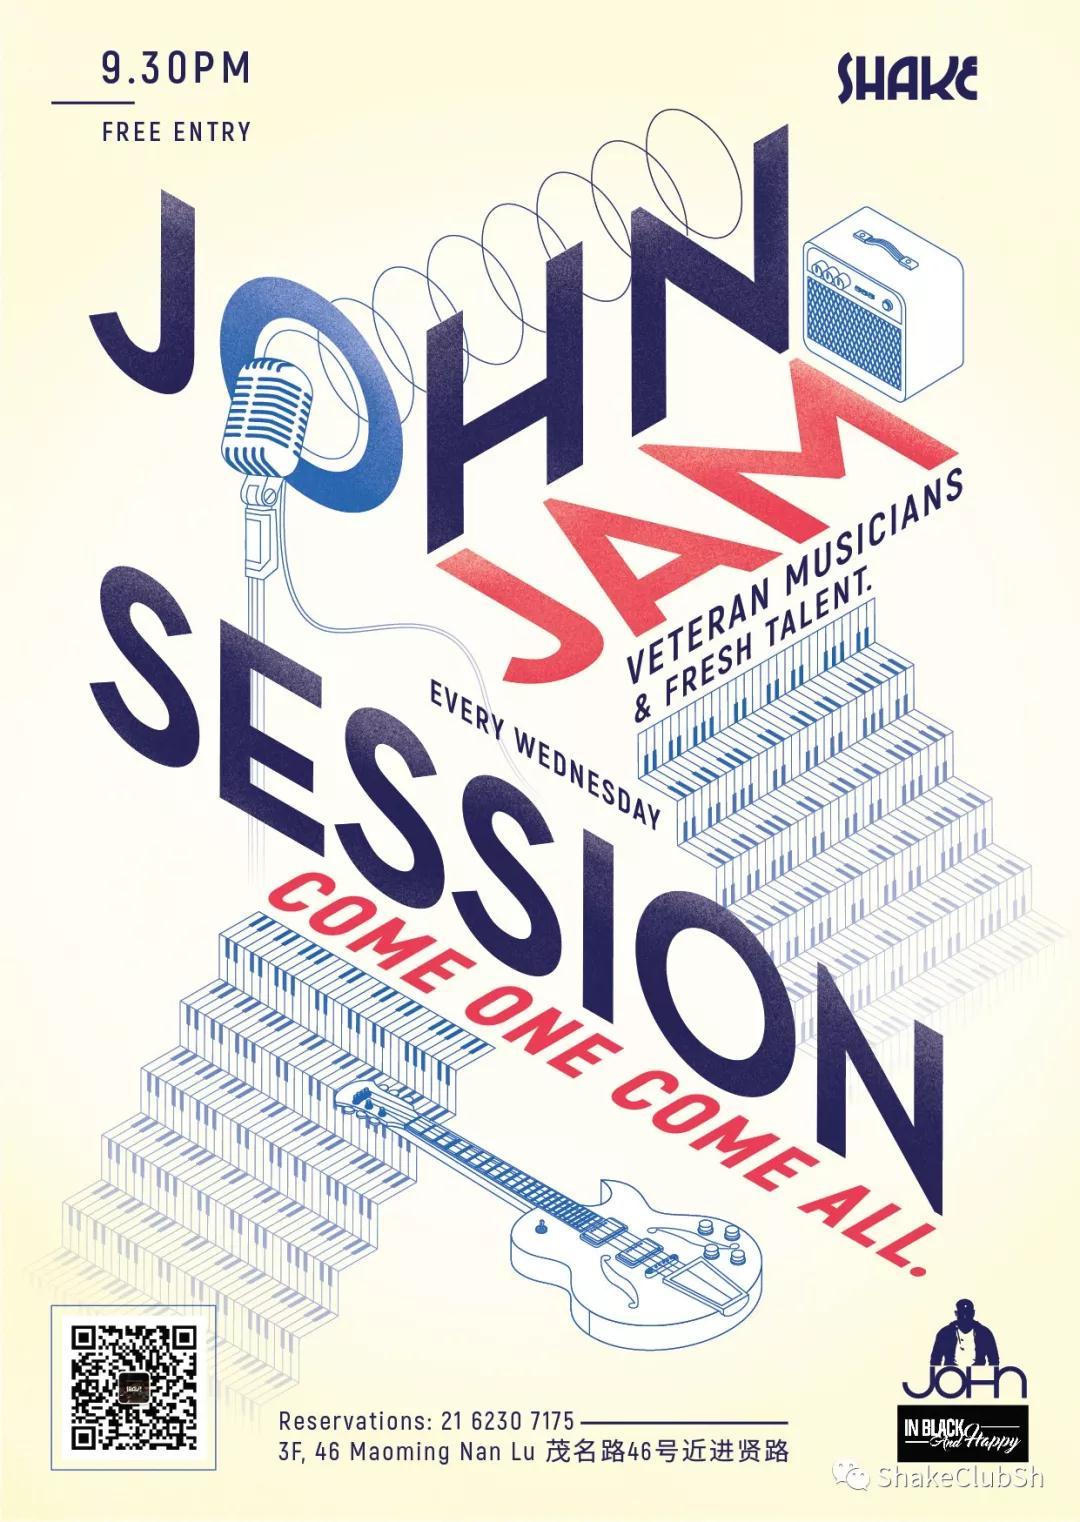 Shake Jam Session